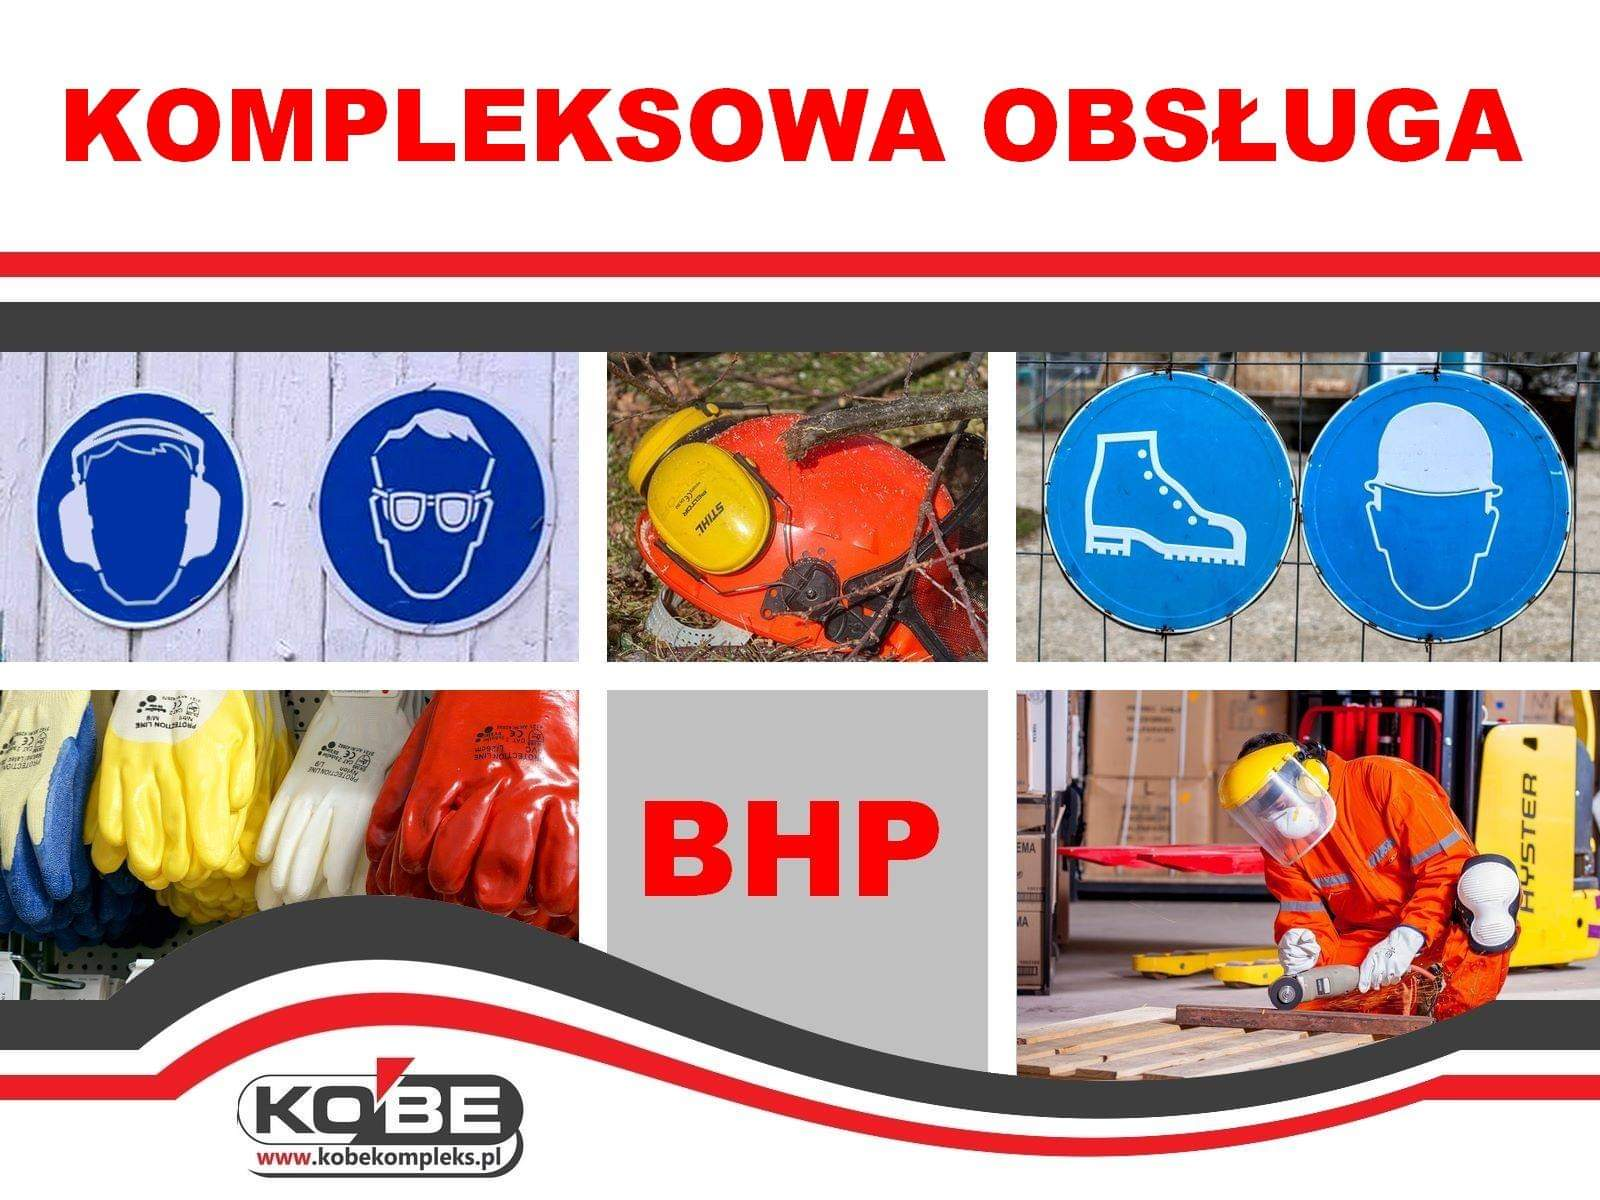 Kompleksowa obsługa BHP tylko w KOBE